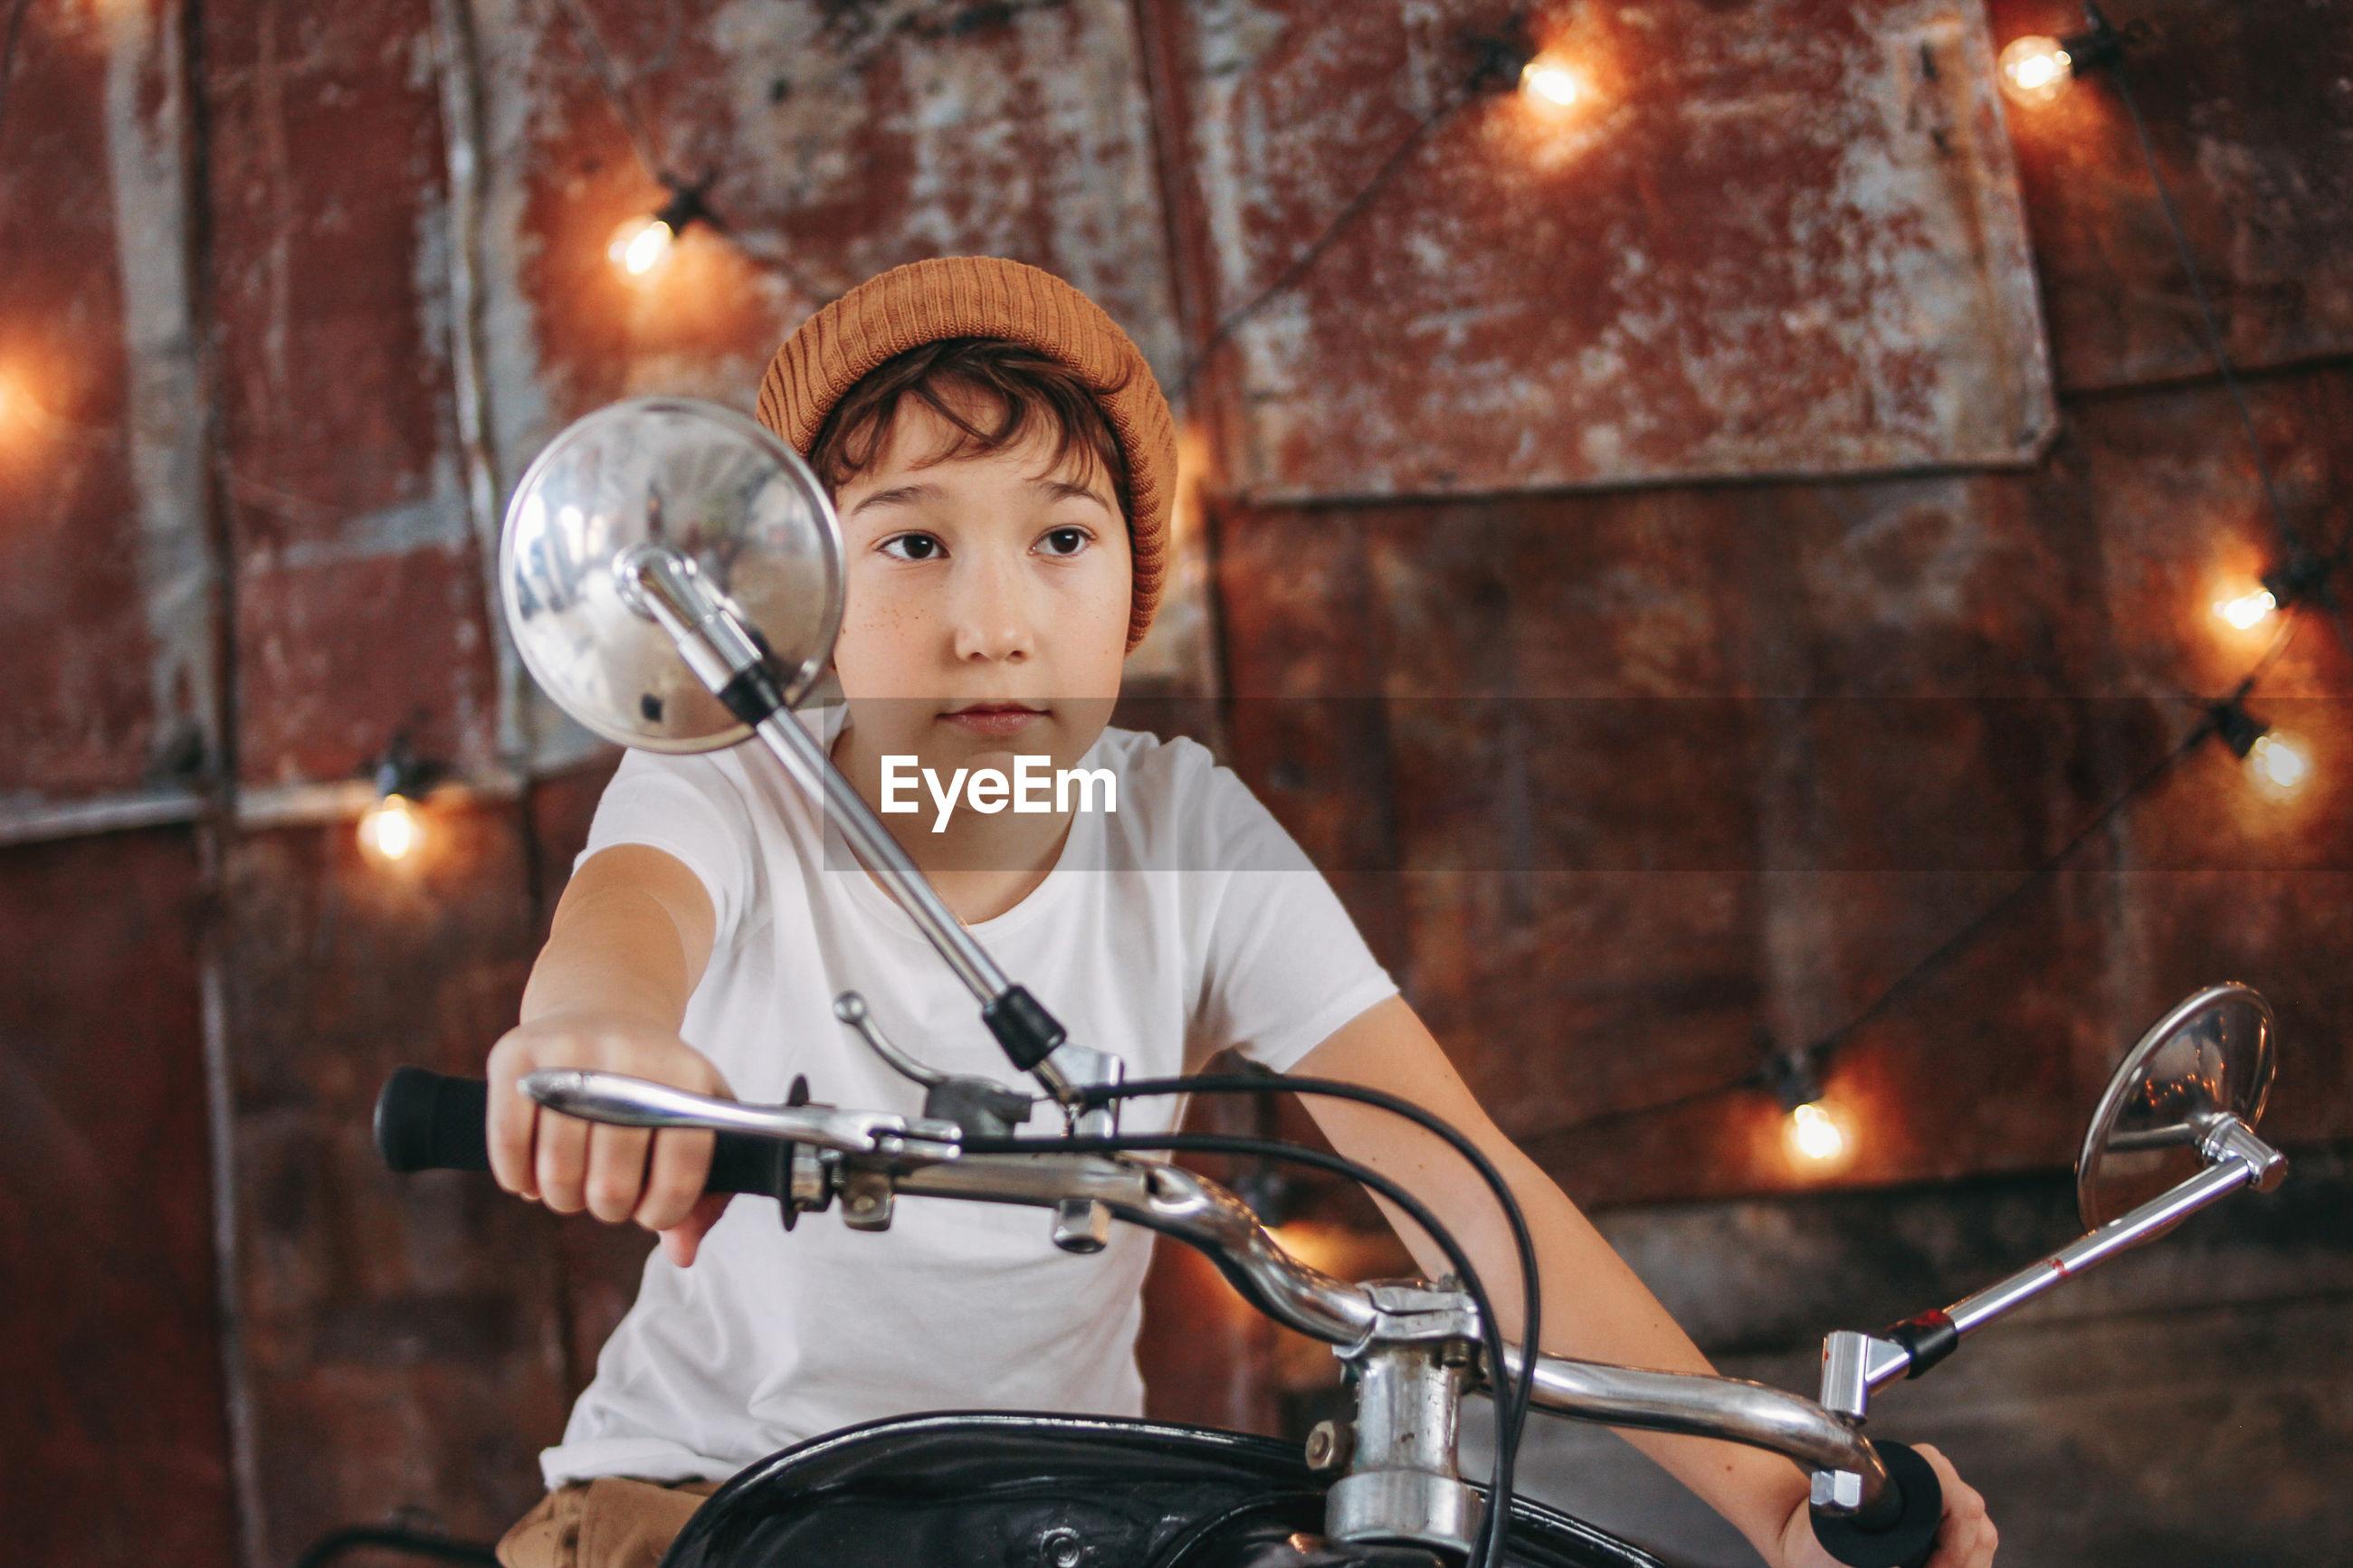 FULL LENGTH OF BOY HOLDING BICYCLE AT ILLUMINATED SHOP